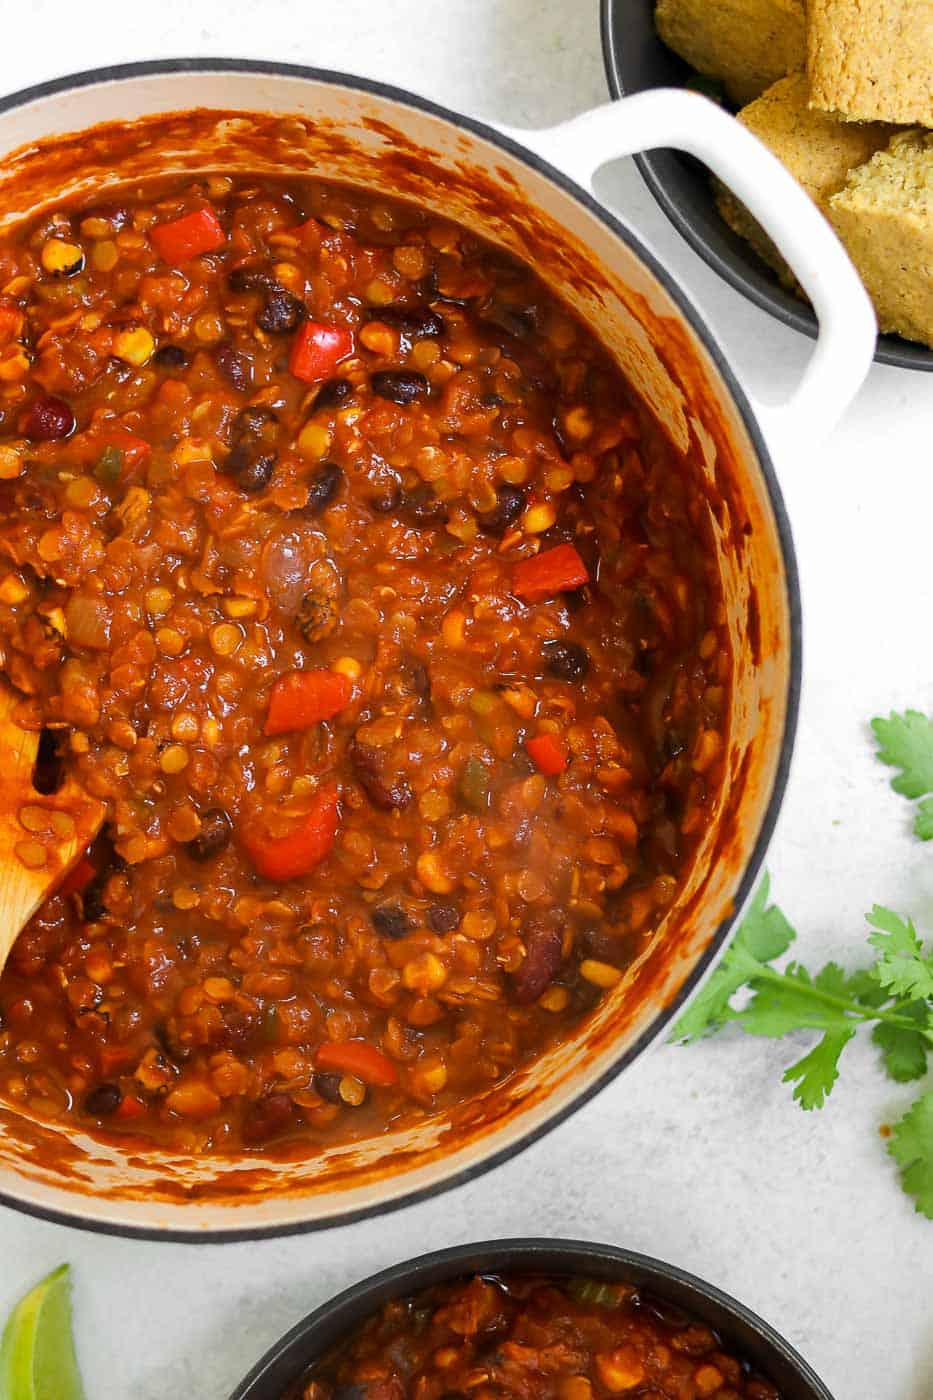 Large pot filled with lentil chili.